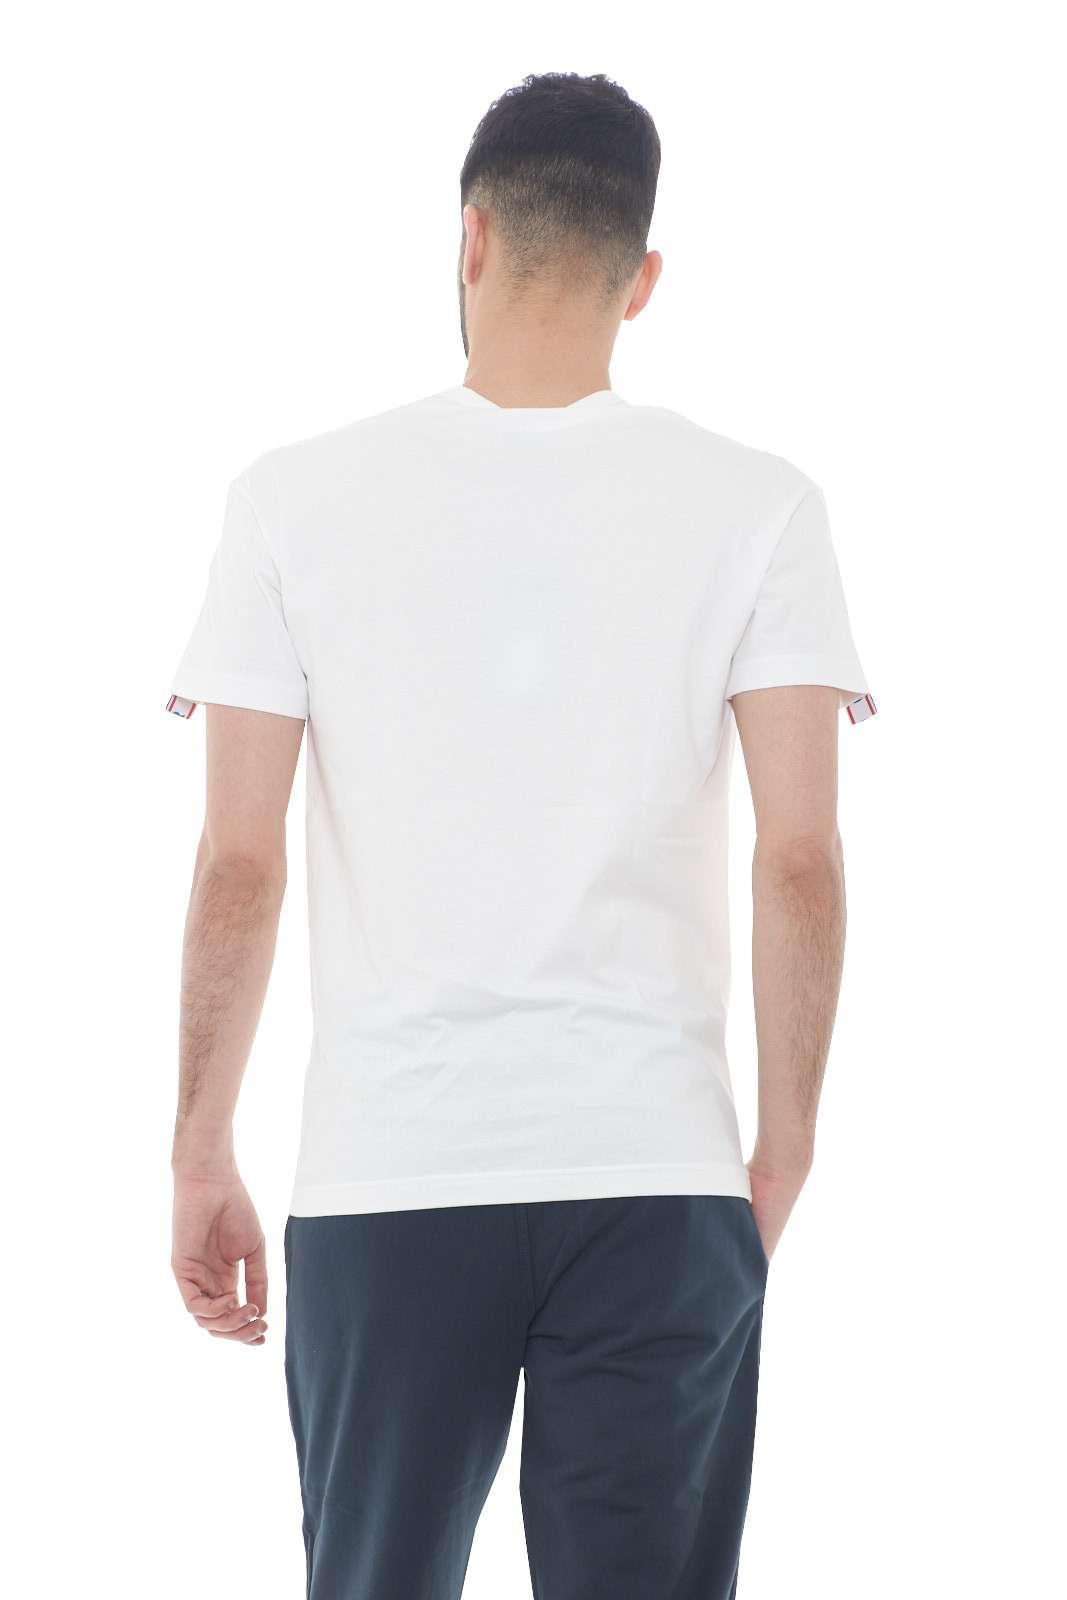 https://www.parmax.com/media/catalog/product/a/i/PE-outlet_parmax-t-shirt-uomo-Colmar-41036SH-C.jpg